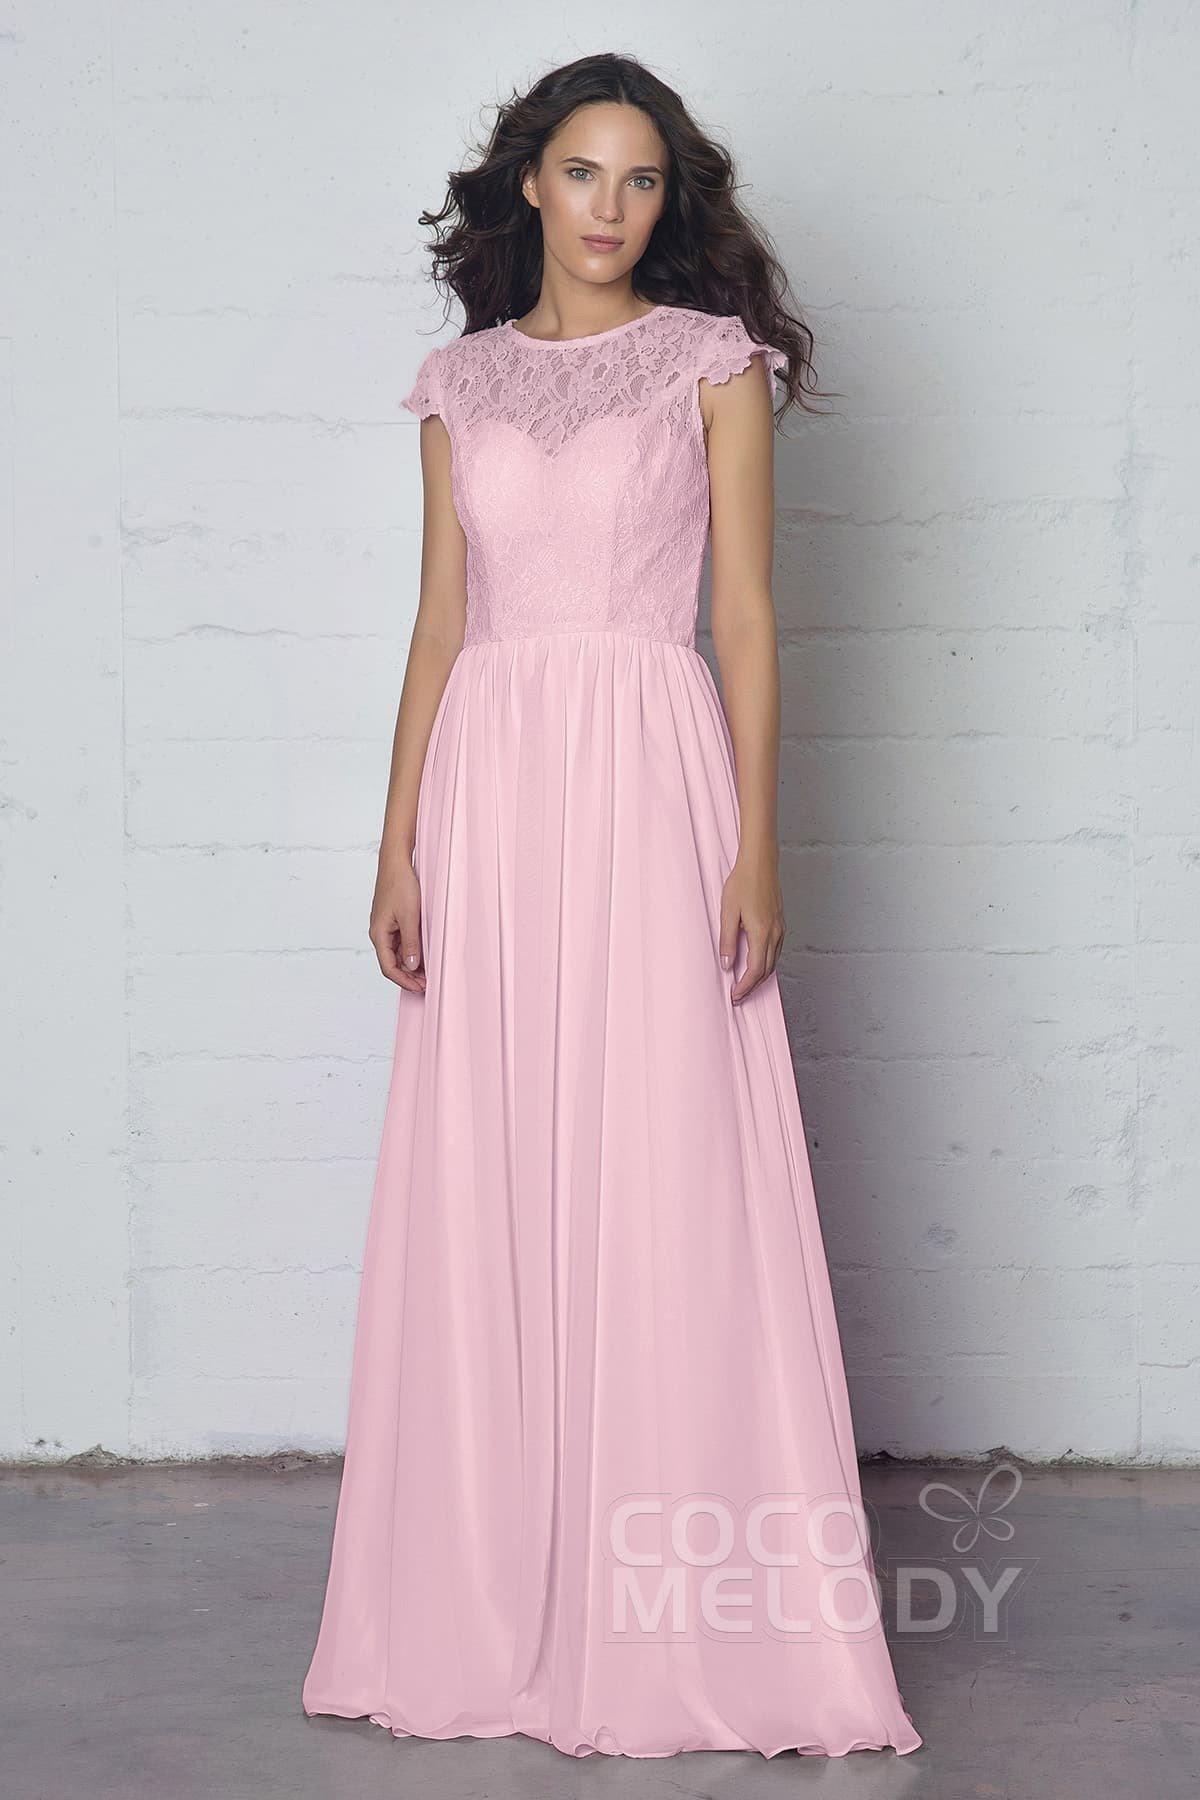 Sears bridesmaid dresses canada luxurious sheath column illusion natural floor length lacechiffon cap sleeve zipper ombrellifo Choice Image